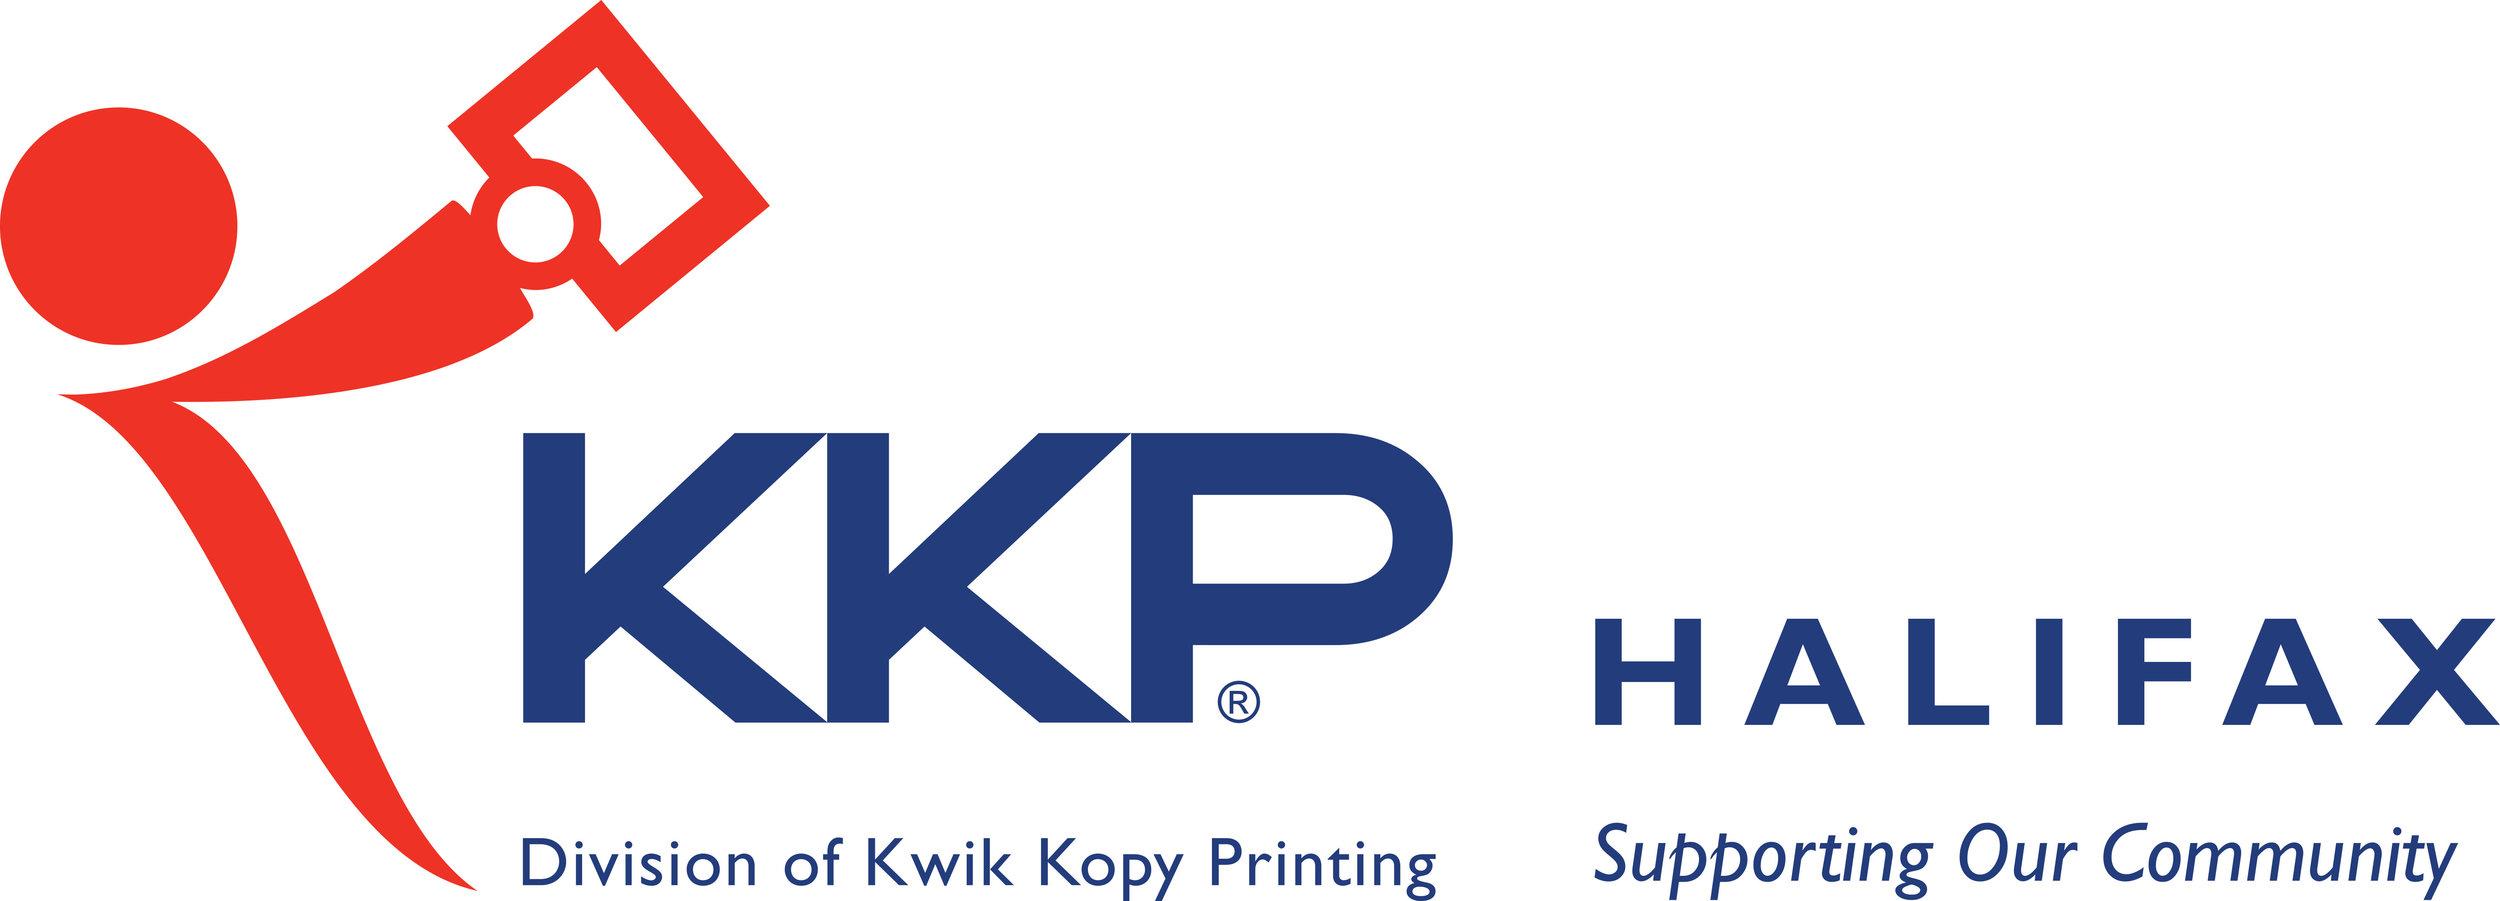 KKP_Logo_Halifax_Supporting_Our_Community.jpg